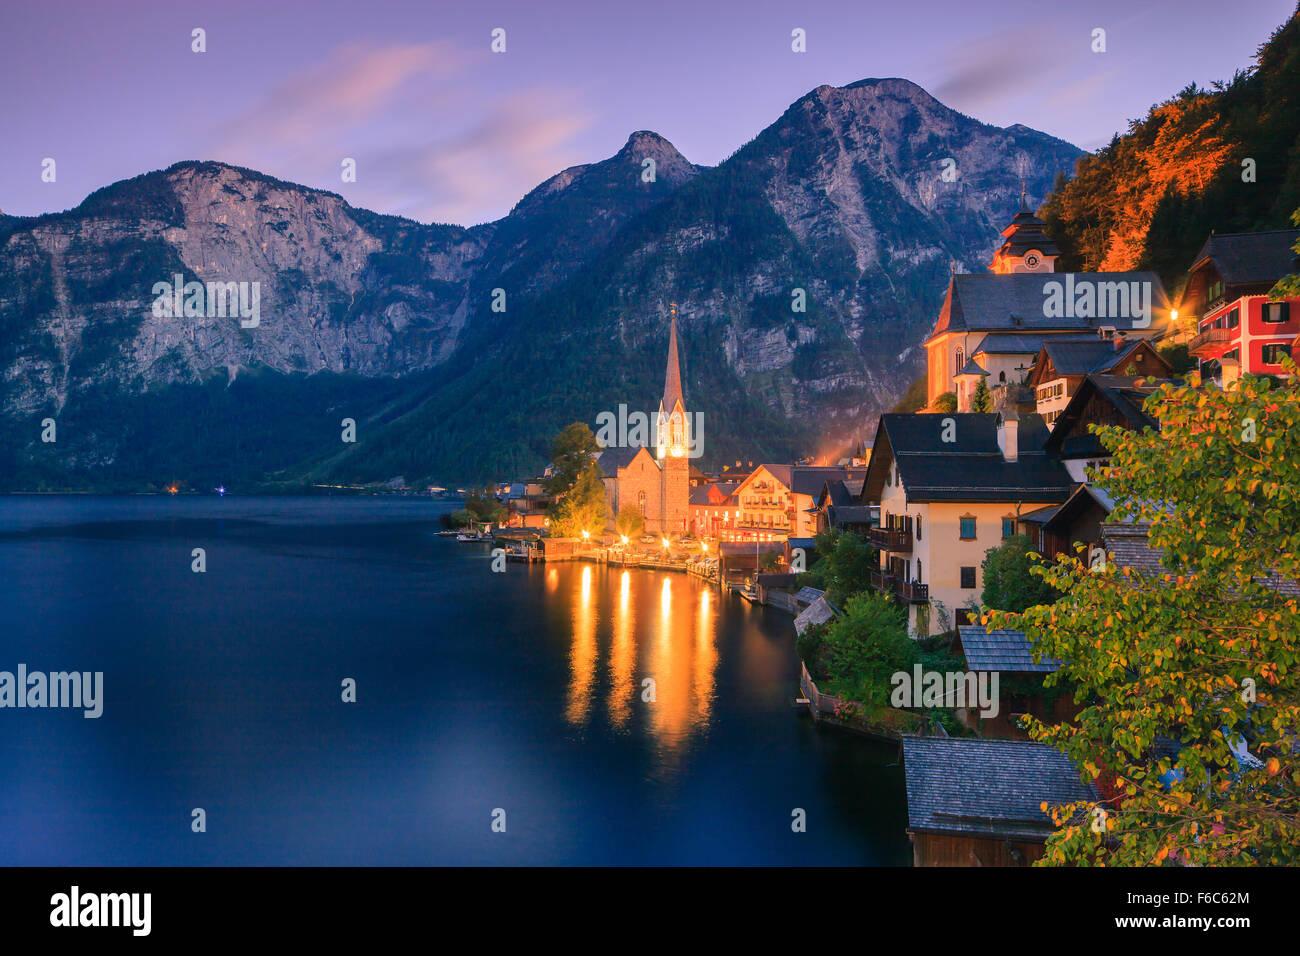 Sunrise in Hallstatt, in upper Austria is a village in the Salzkammergut, a region in Austria. - Stock Image